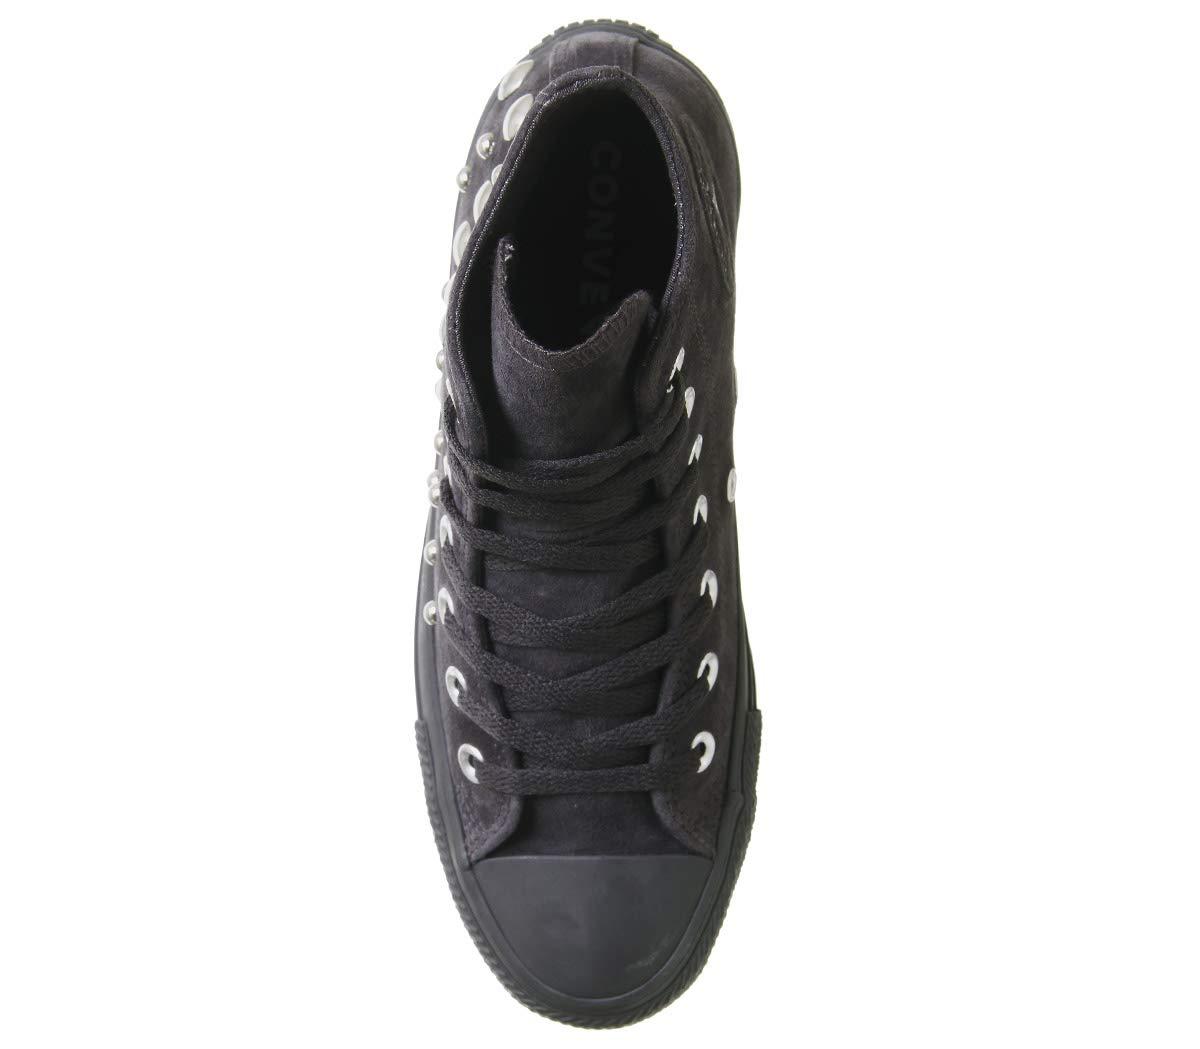 Converse CHUCKS ALL STAR STAR STAR OX Weiß M9165 B07HC1VSM3 Basketballschuhe Großer Räumungsverkauf d6ddcf